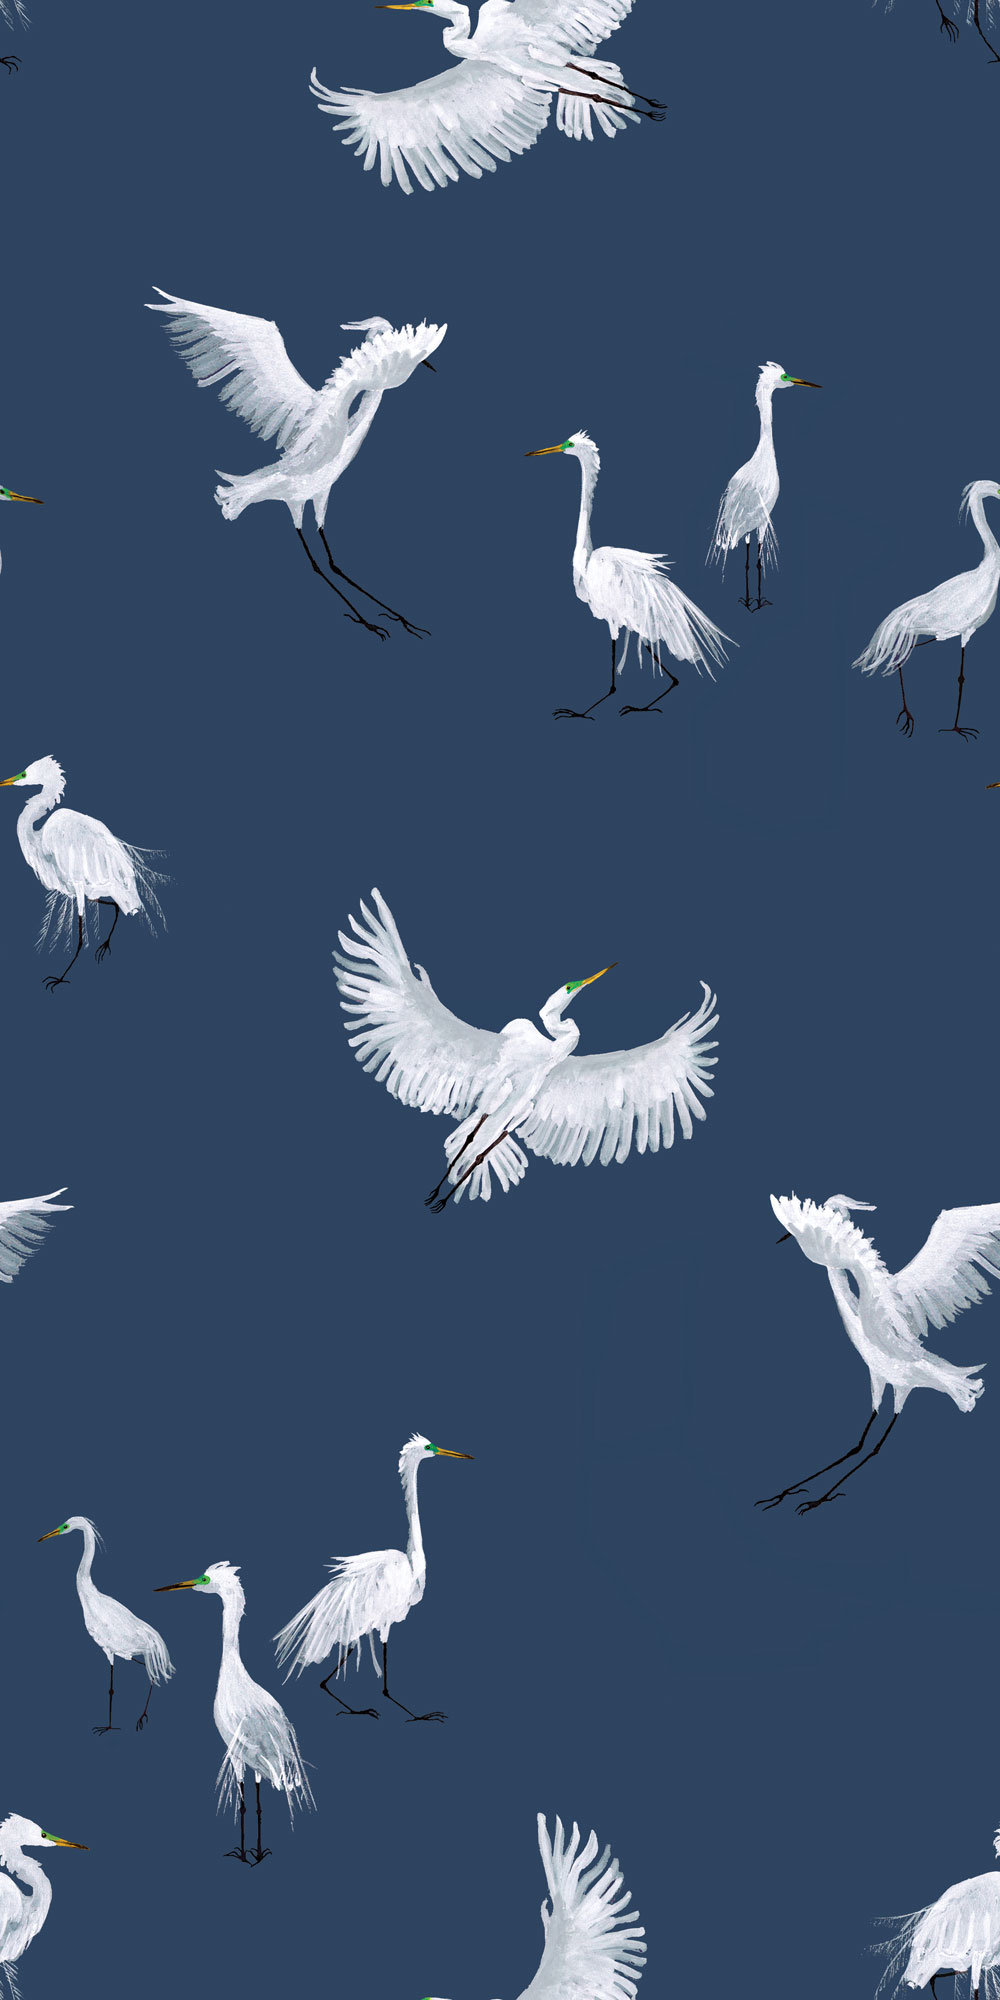 Petronella Hall Egrets Twilight Wallpaper main image